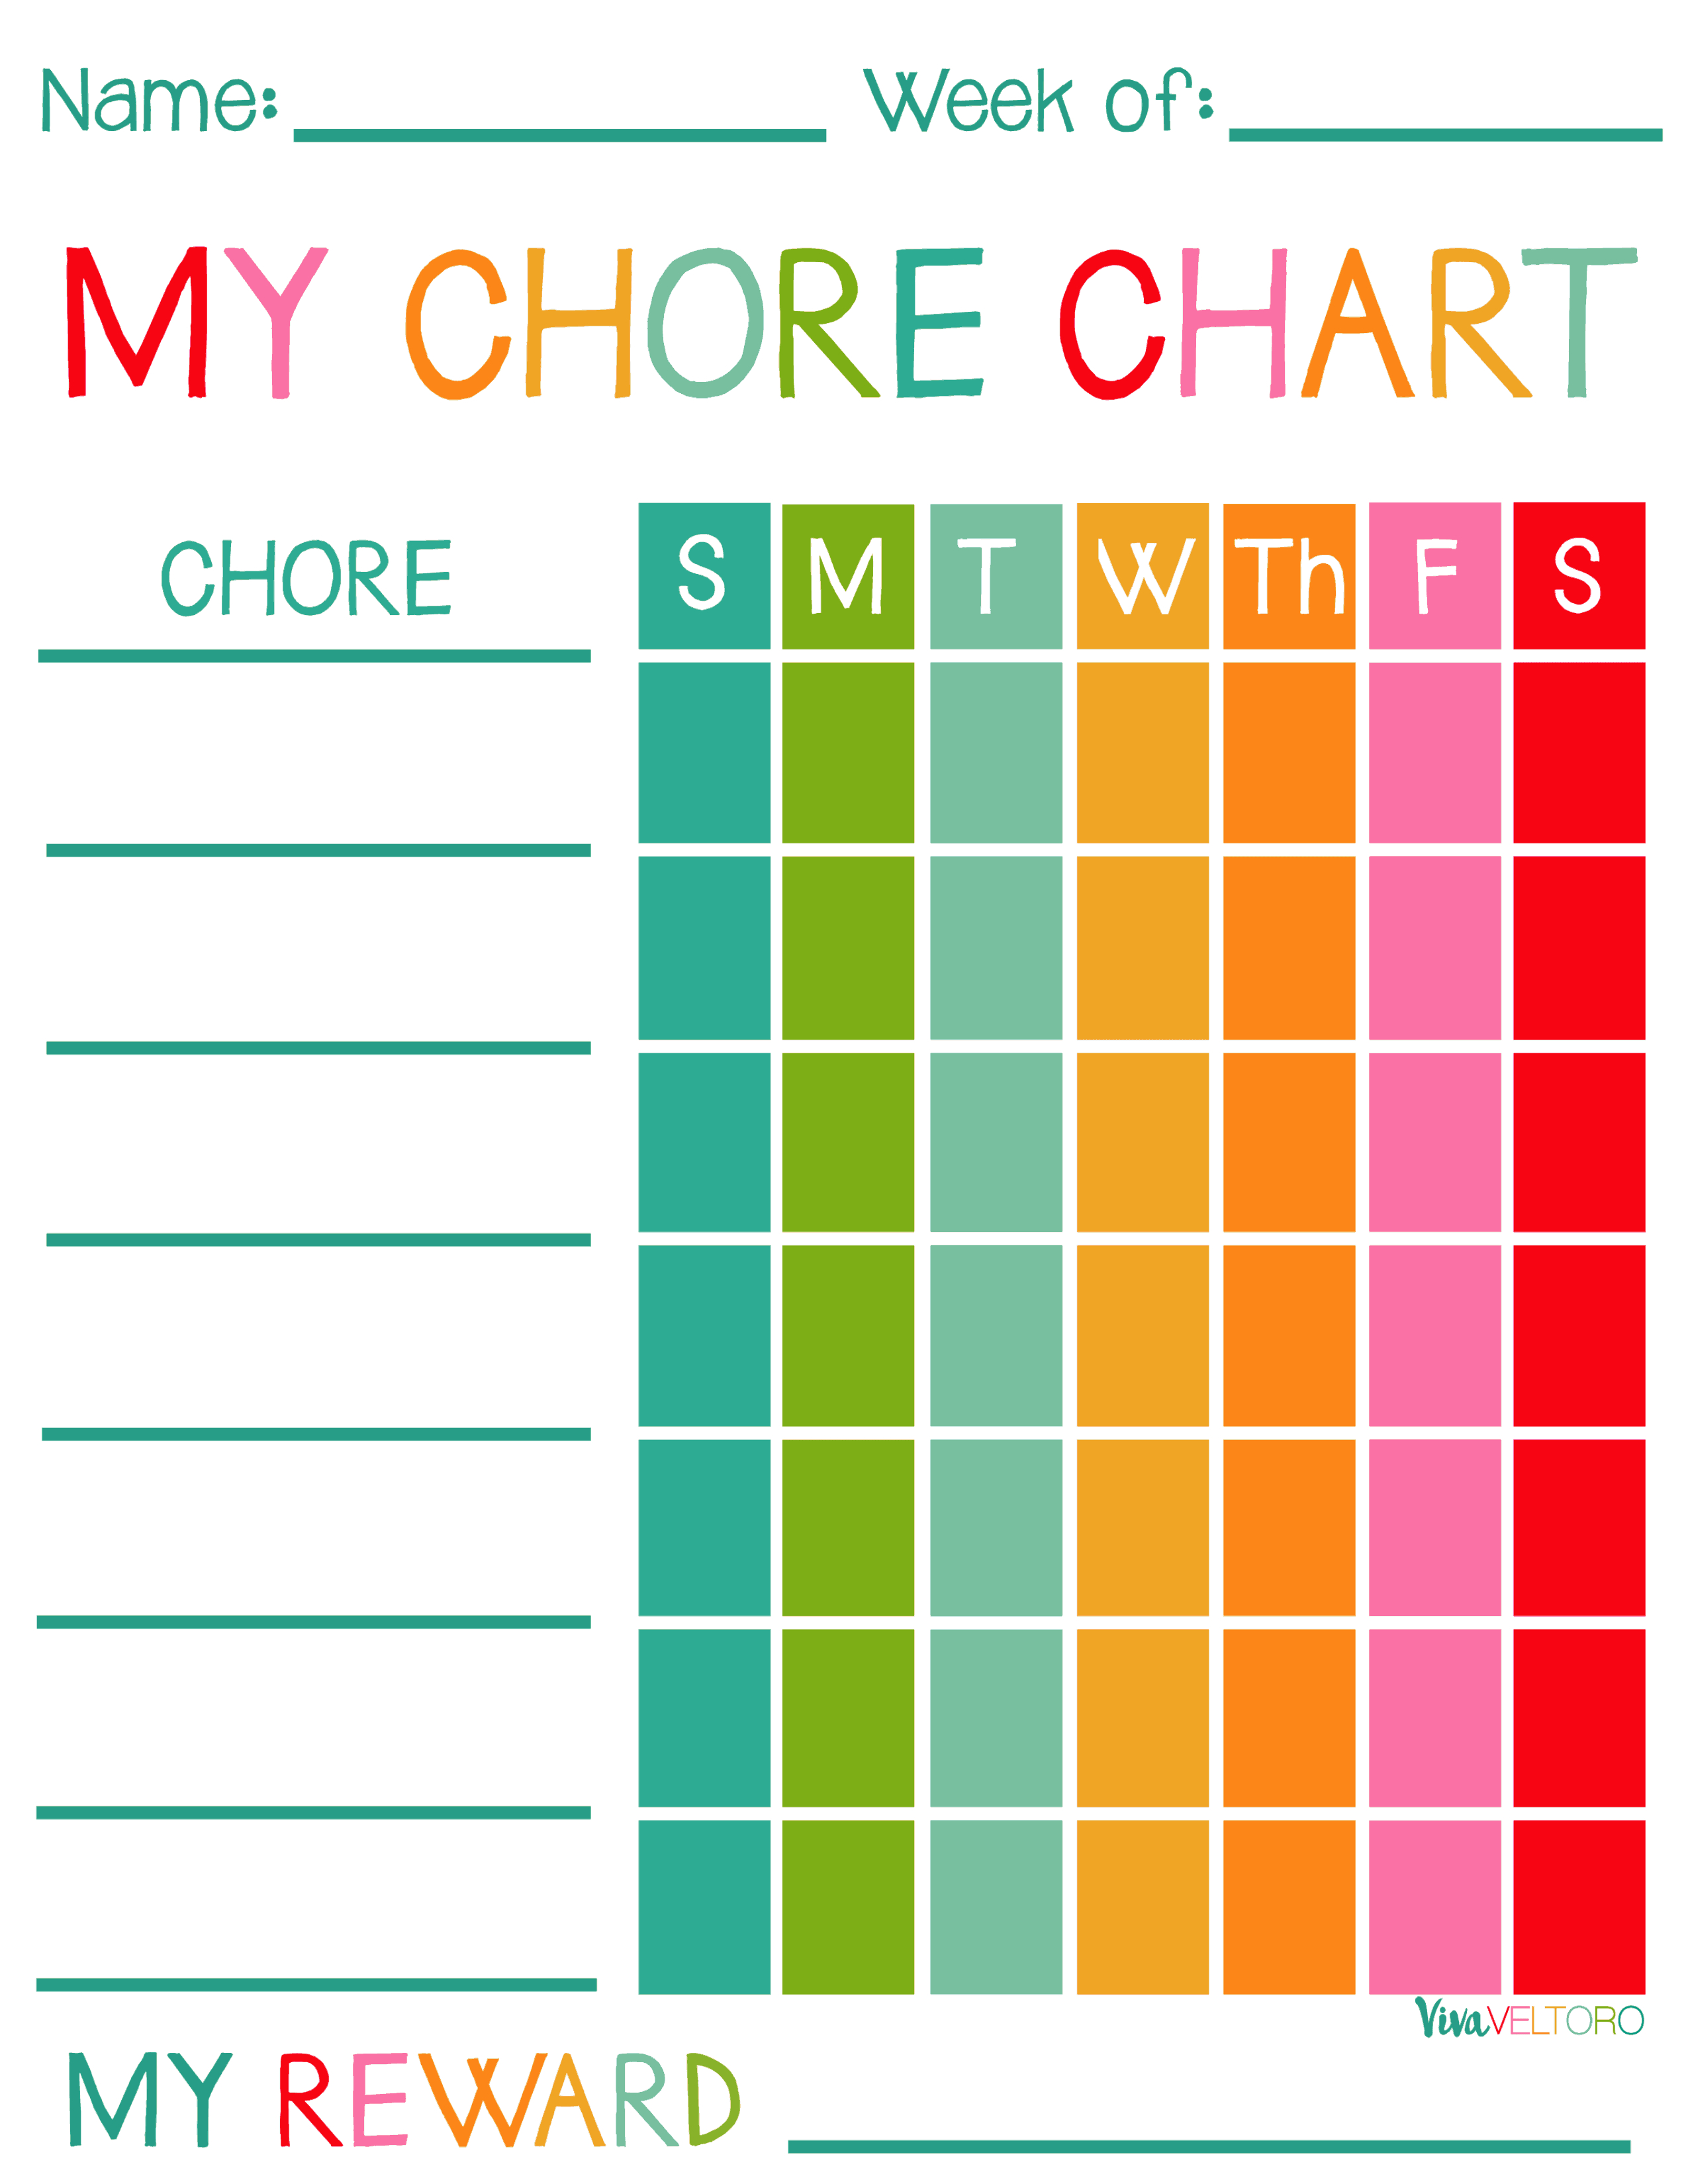 Free Printable Chore Charts For Kids! - Viva Veltoro - Free Printable Chore Charts